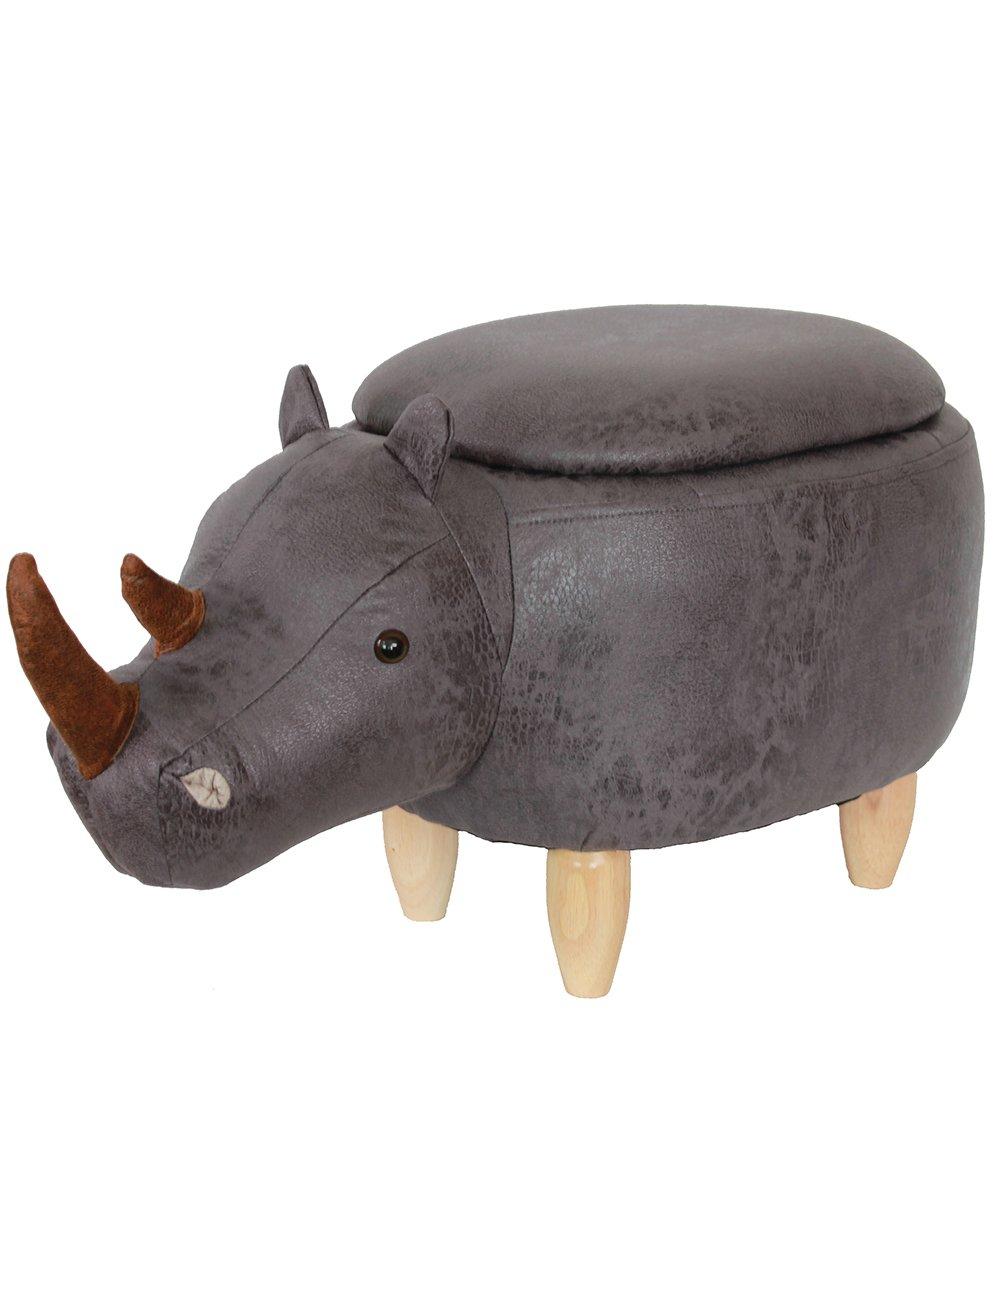 HAOSOON Animal ottoman Series Storage Ottoman Footrest Stool with Vivid Adorable Animal-Like Features(Rhinoceros) (grey) by HAOSOON (Image #1)